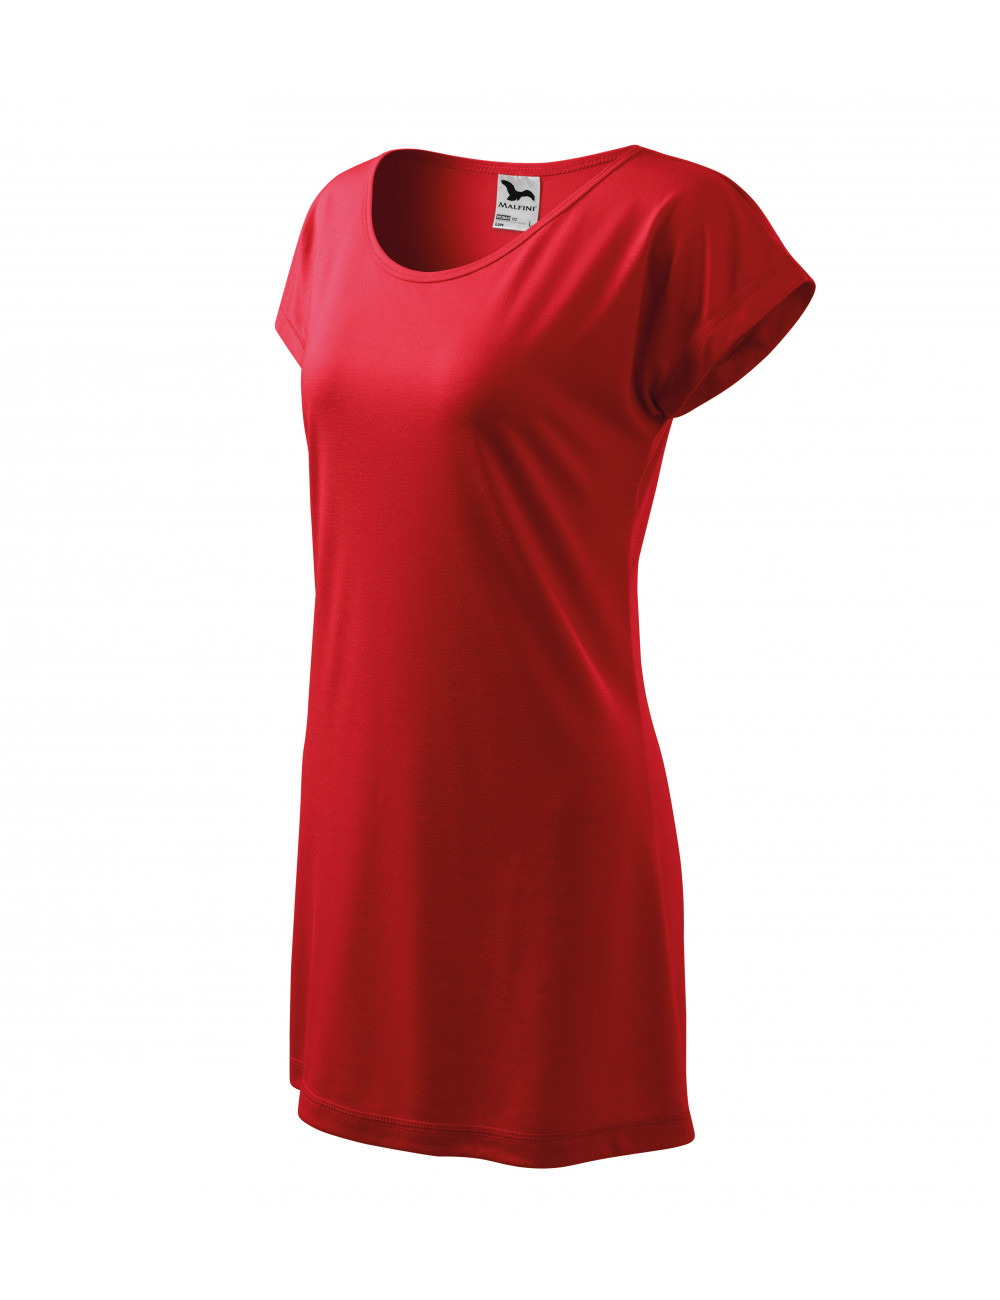 Adler MALFINI Koszulka/sukienka damska Love 123 czerwony